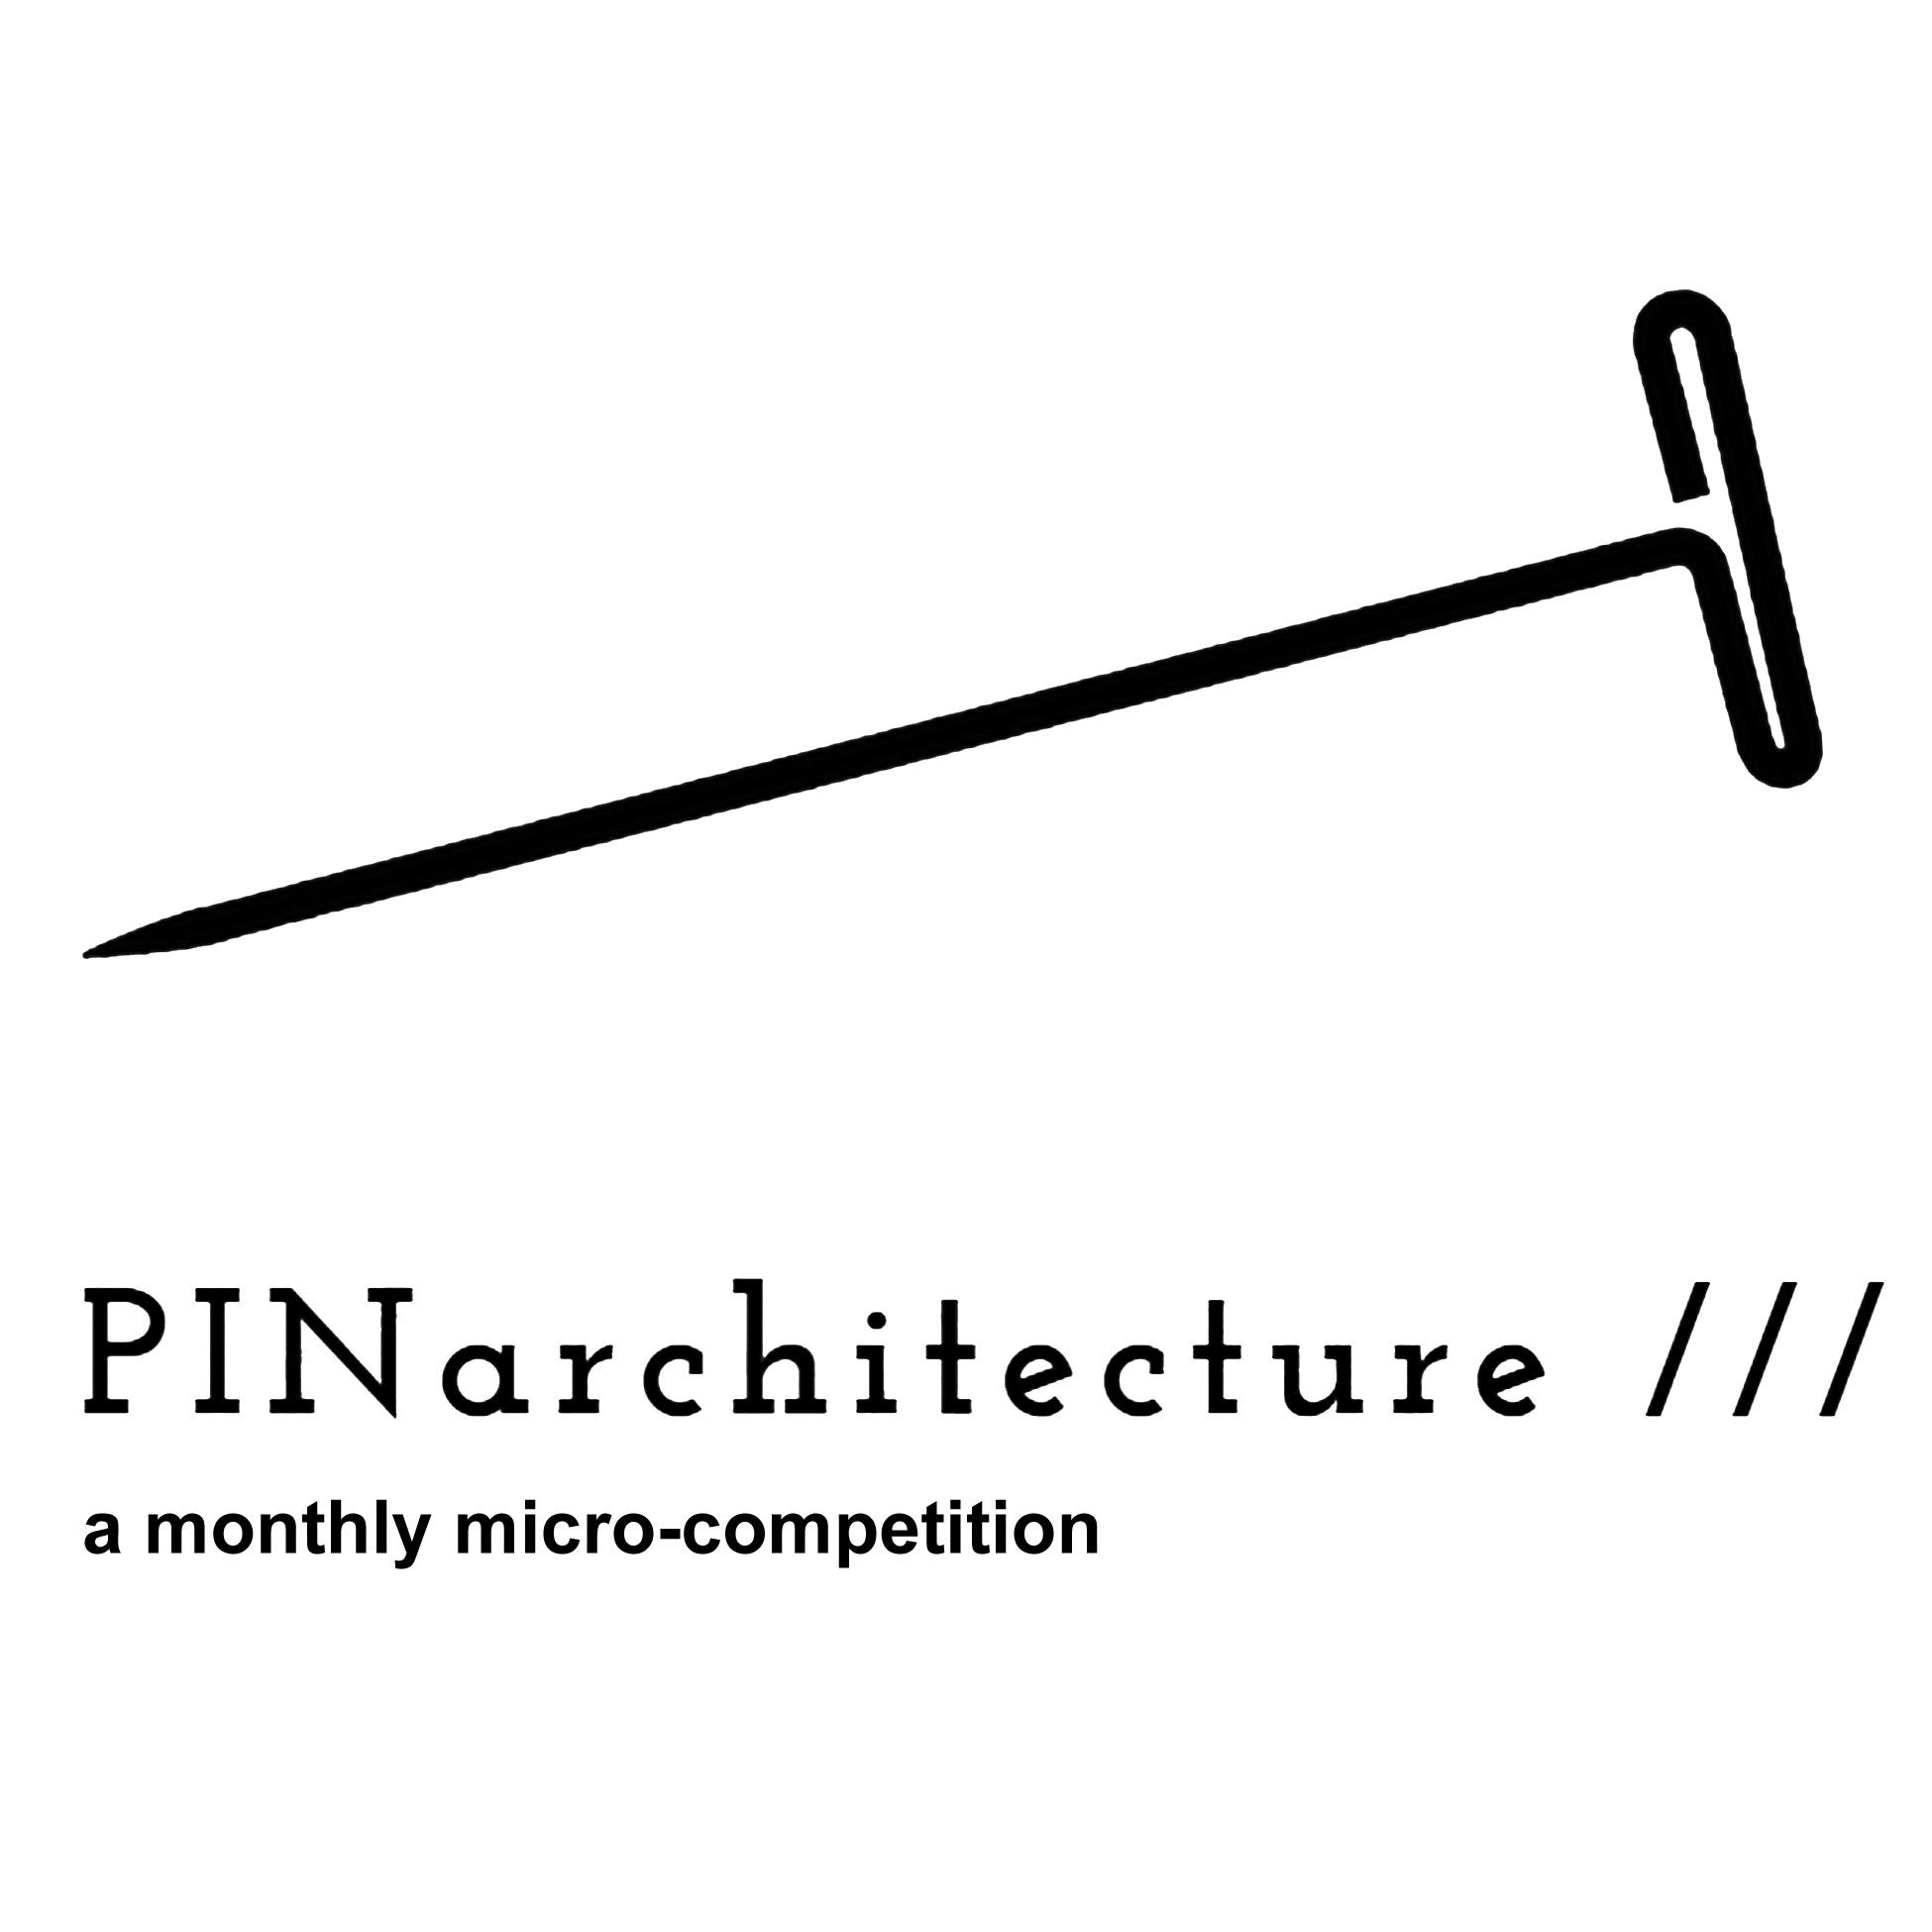 PINarchitecture_use.jpg